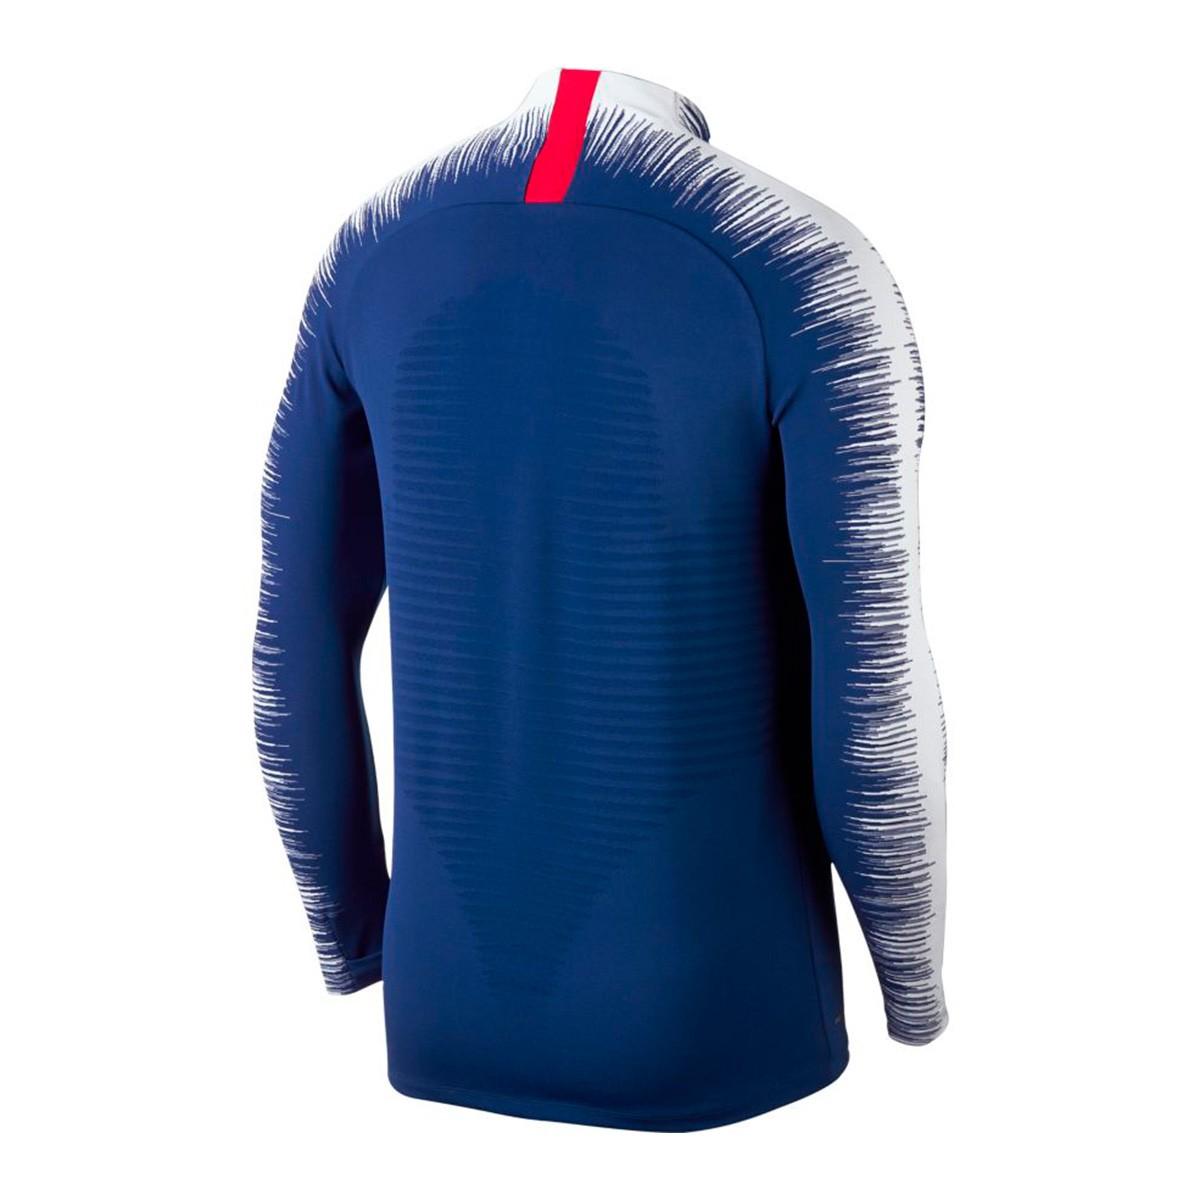 bfec142a91 Sweatshirt Nike Chelsea FC VaporKnit Strike 2018-2019 Rush blue-White -  Football store Fútbol Emotion